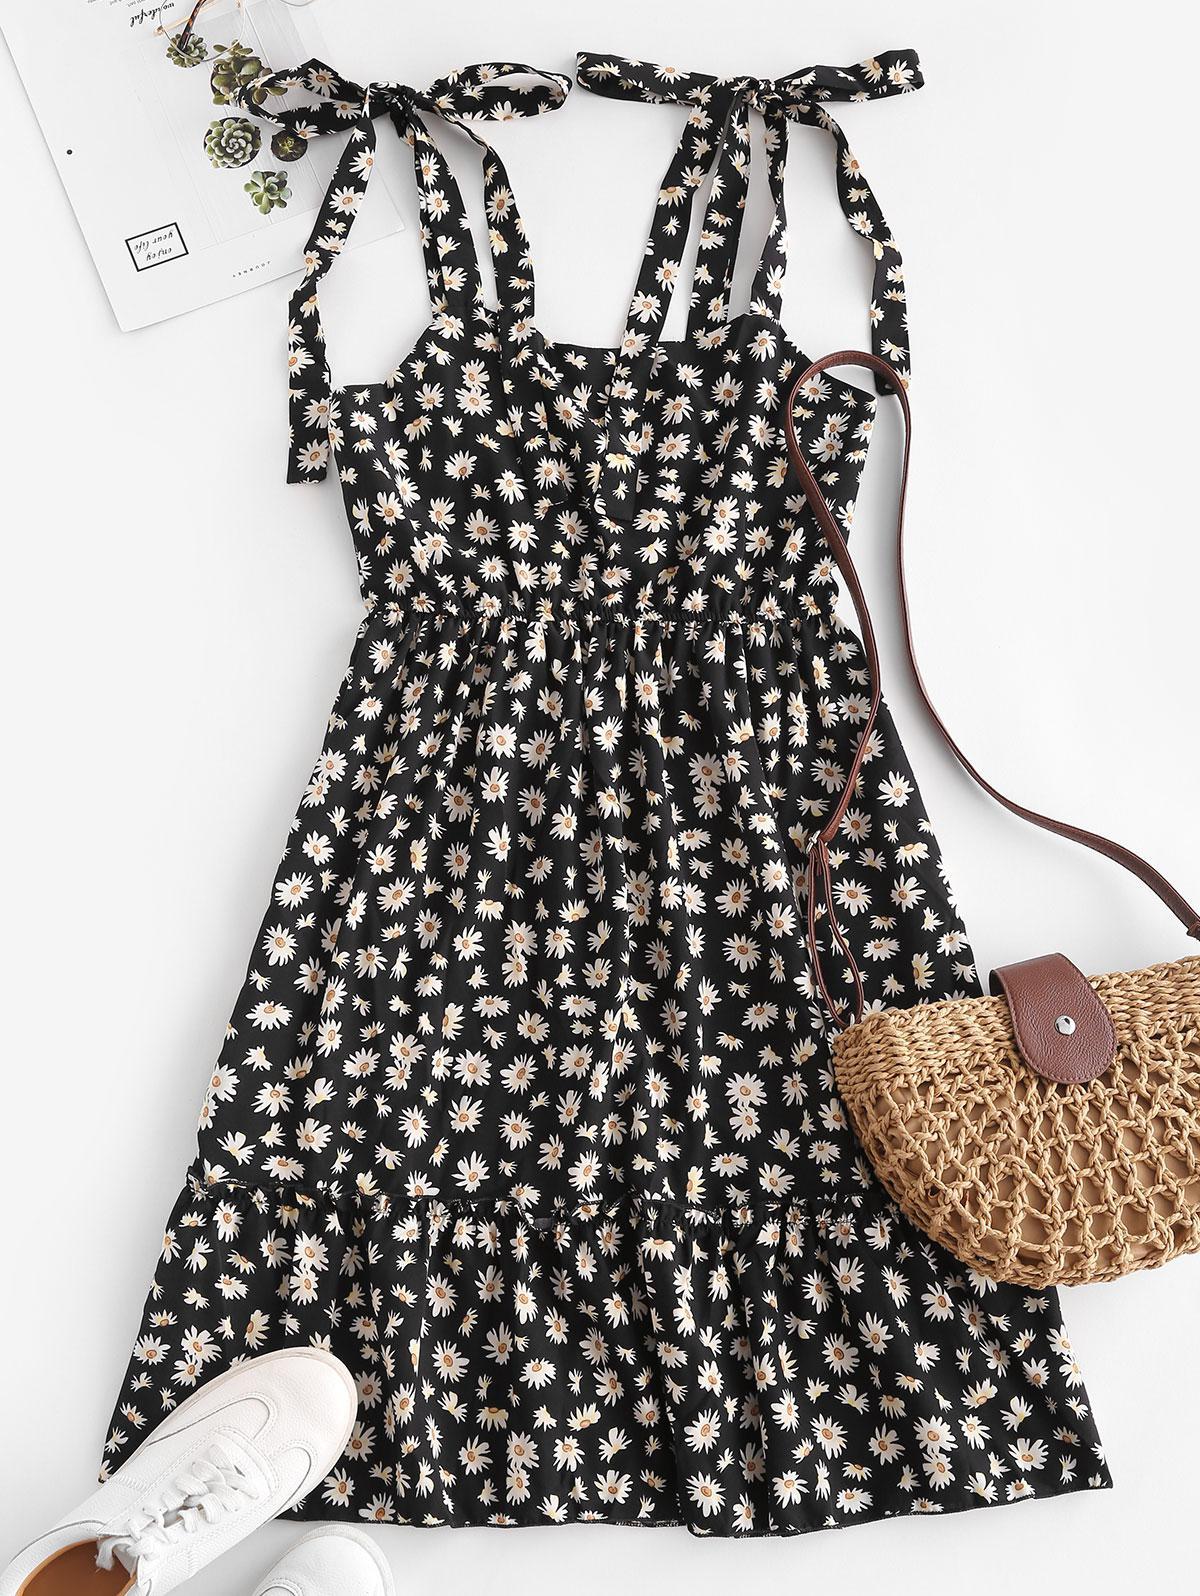 Sleeveless Daisy Print Tie Shoulder Dress